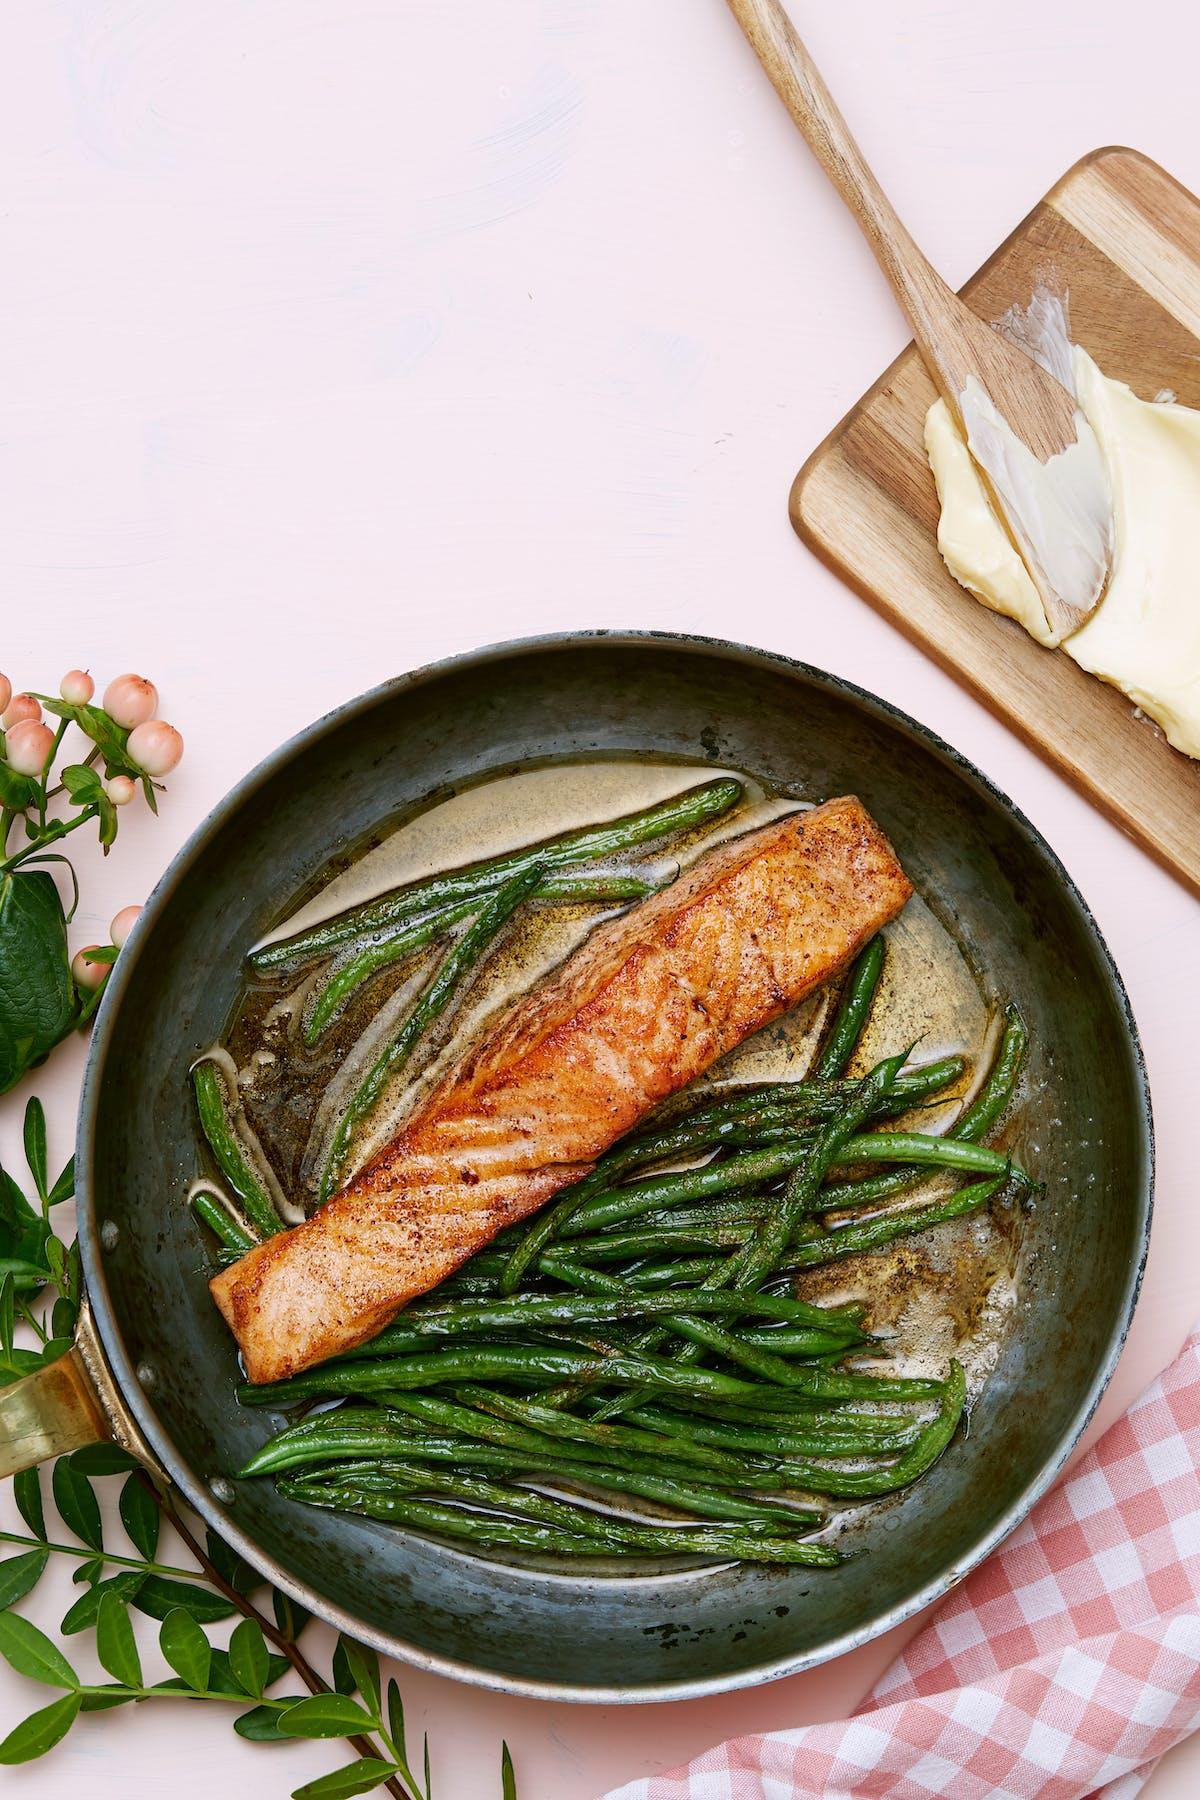 Salmón frito keto con ejotes verdes